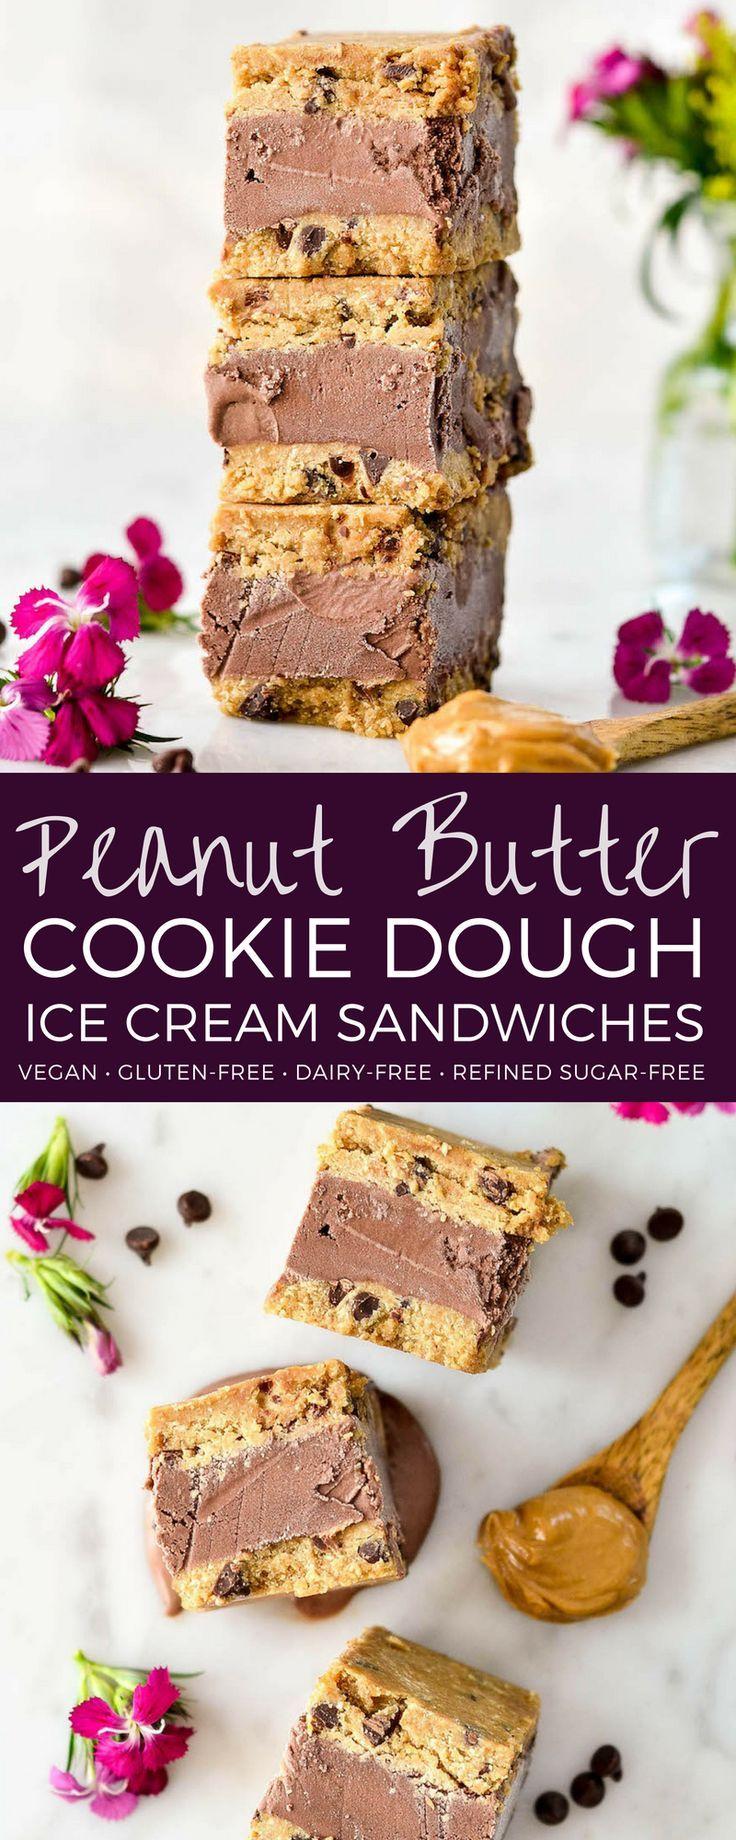 Vegan & Gluten-Free Peanut Butter Cookie Dough Ice Cream Sandwiches are a health… – Summer Recipes